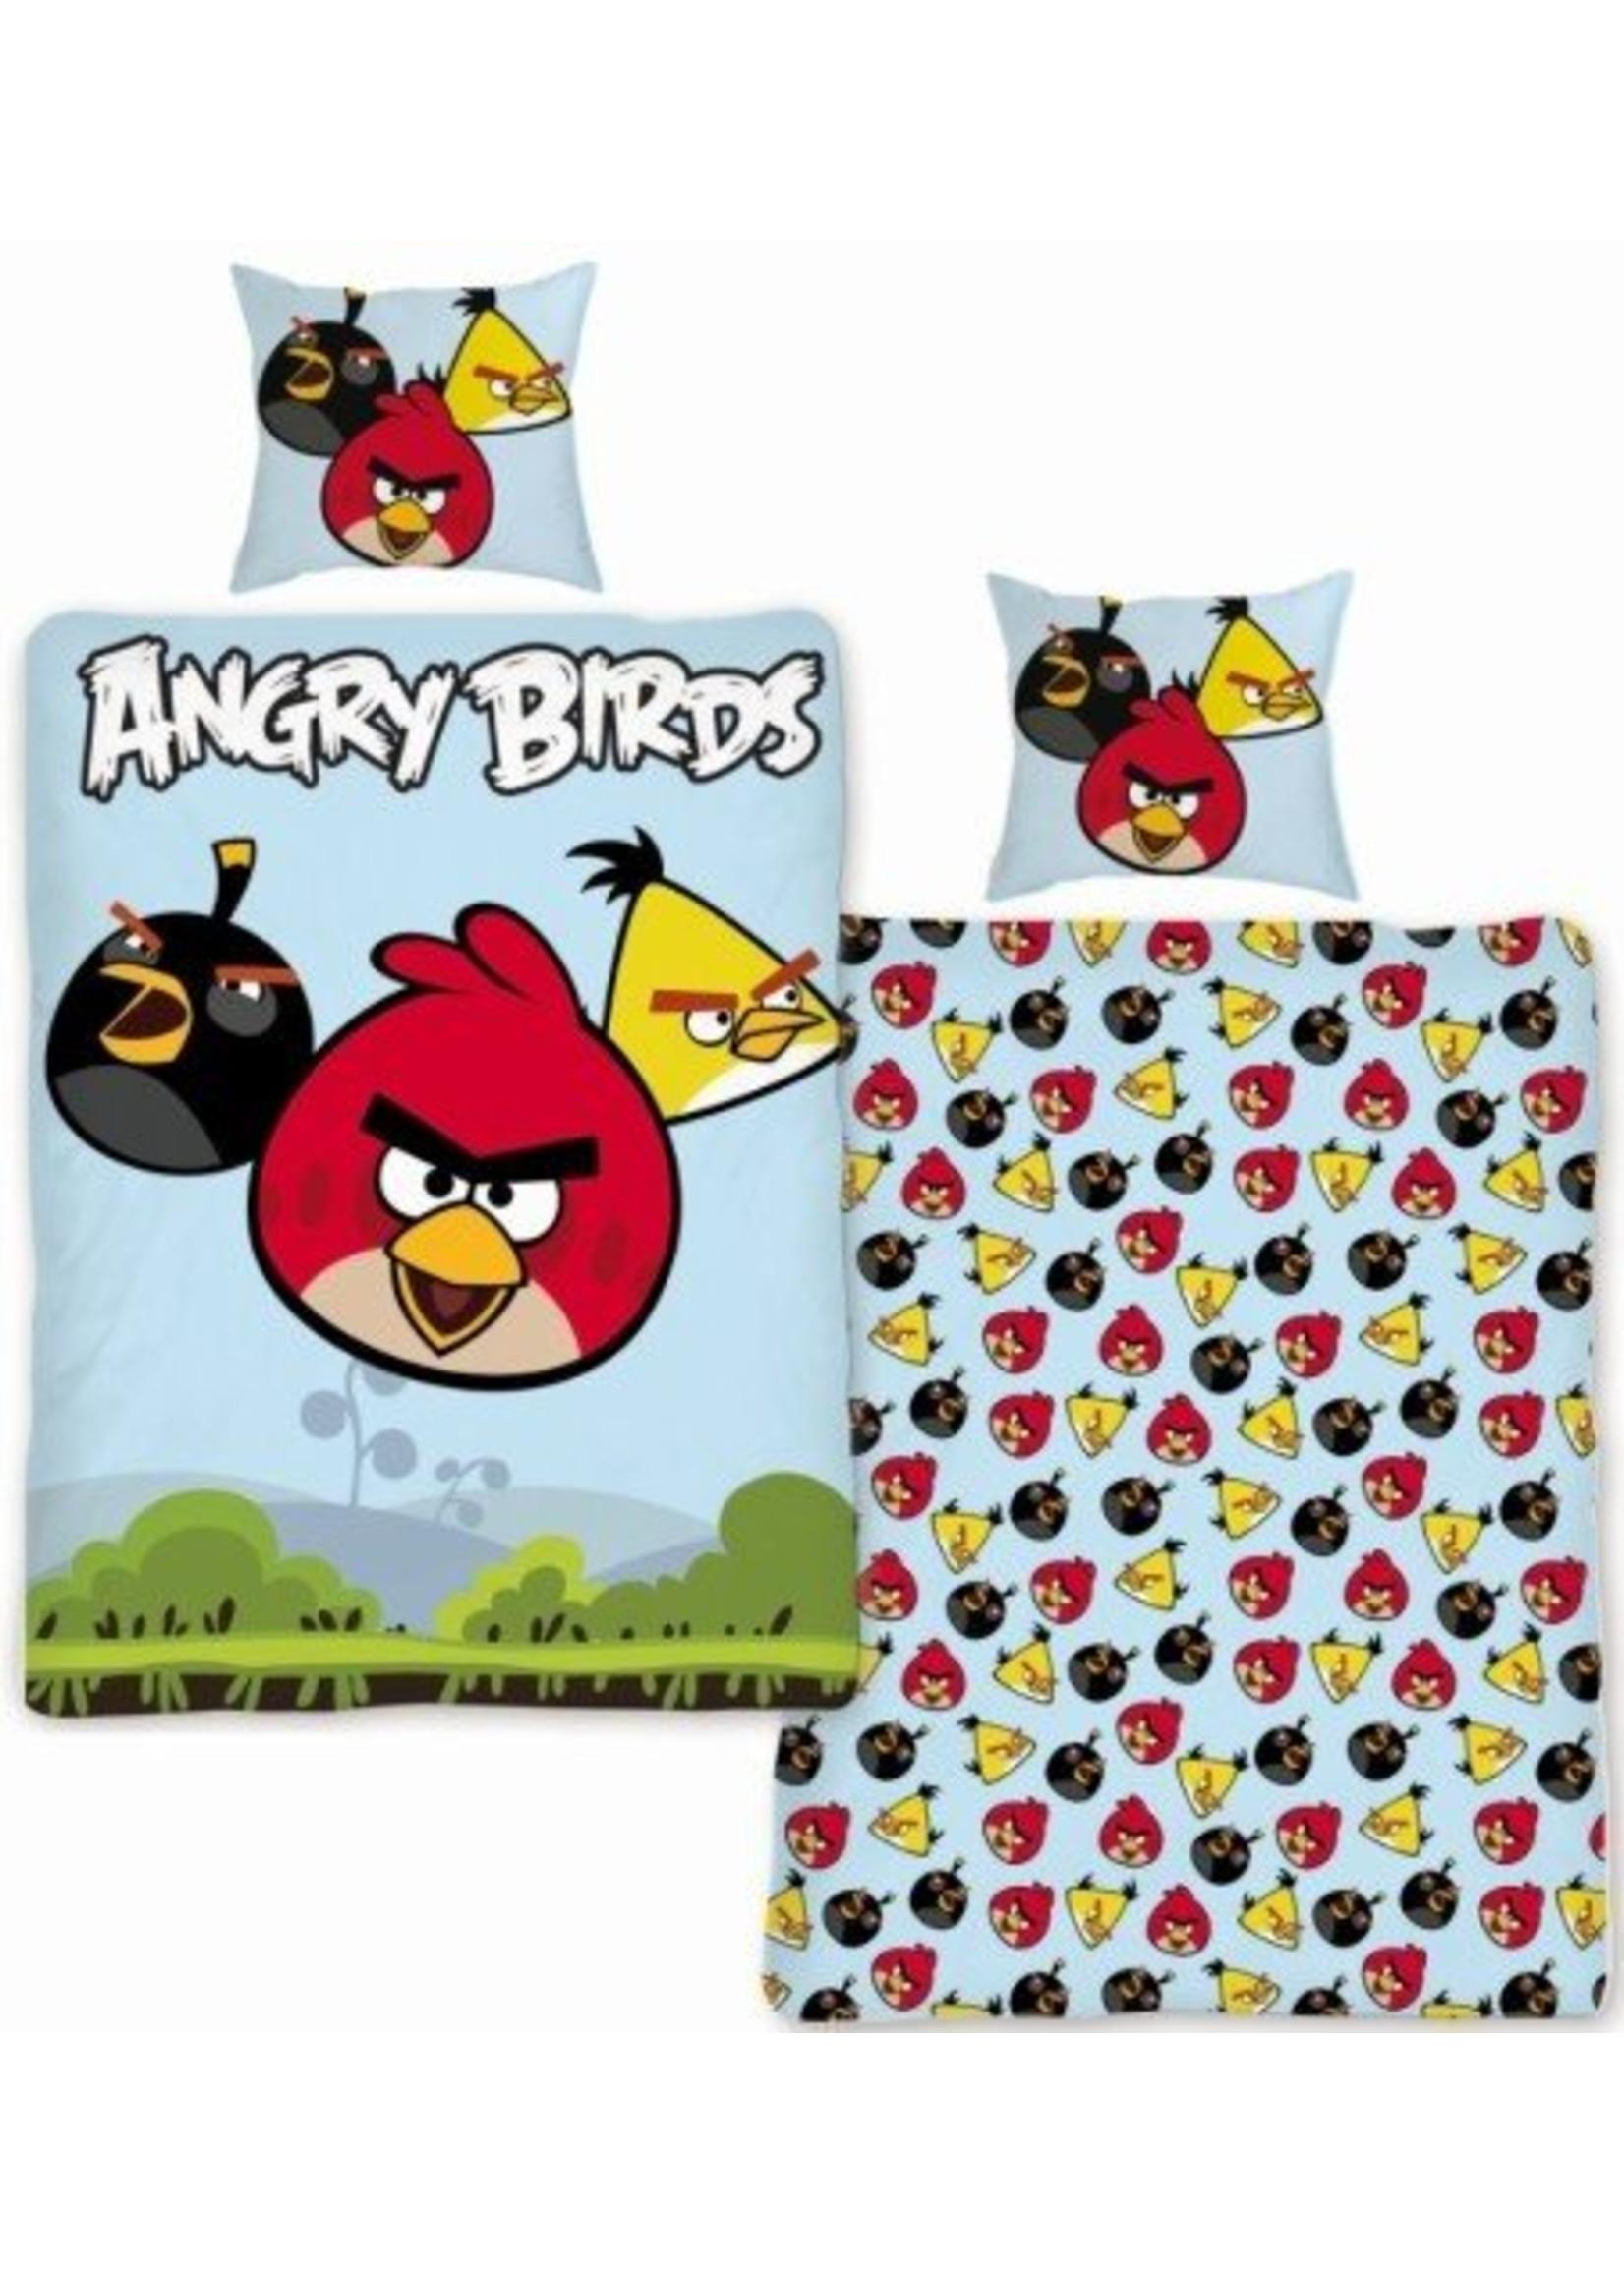 Angry Birds Dekbedovertrek 140x200 Katoen AB01017